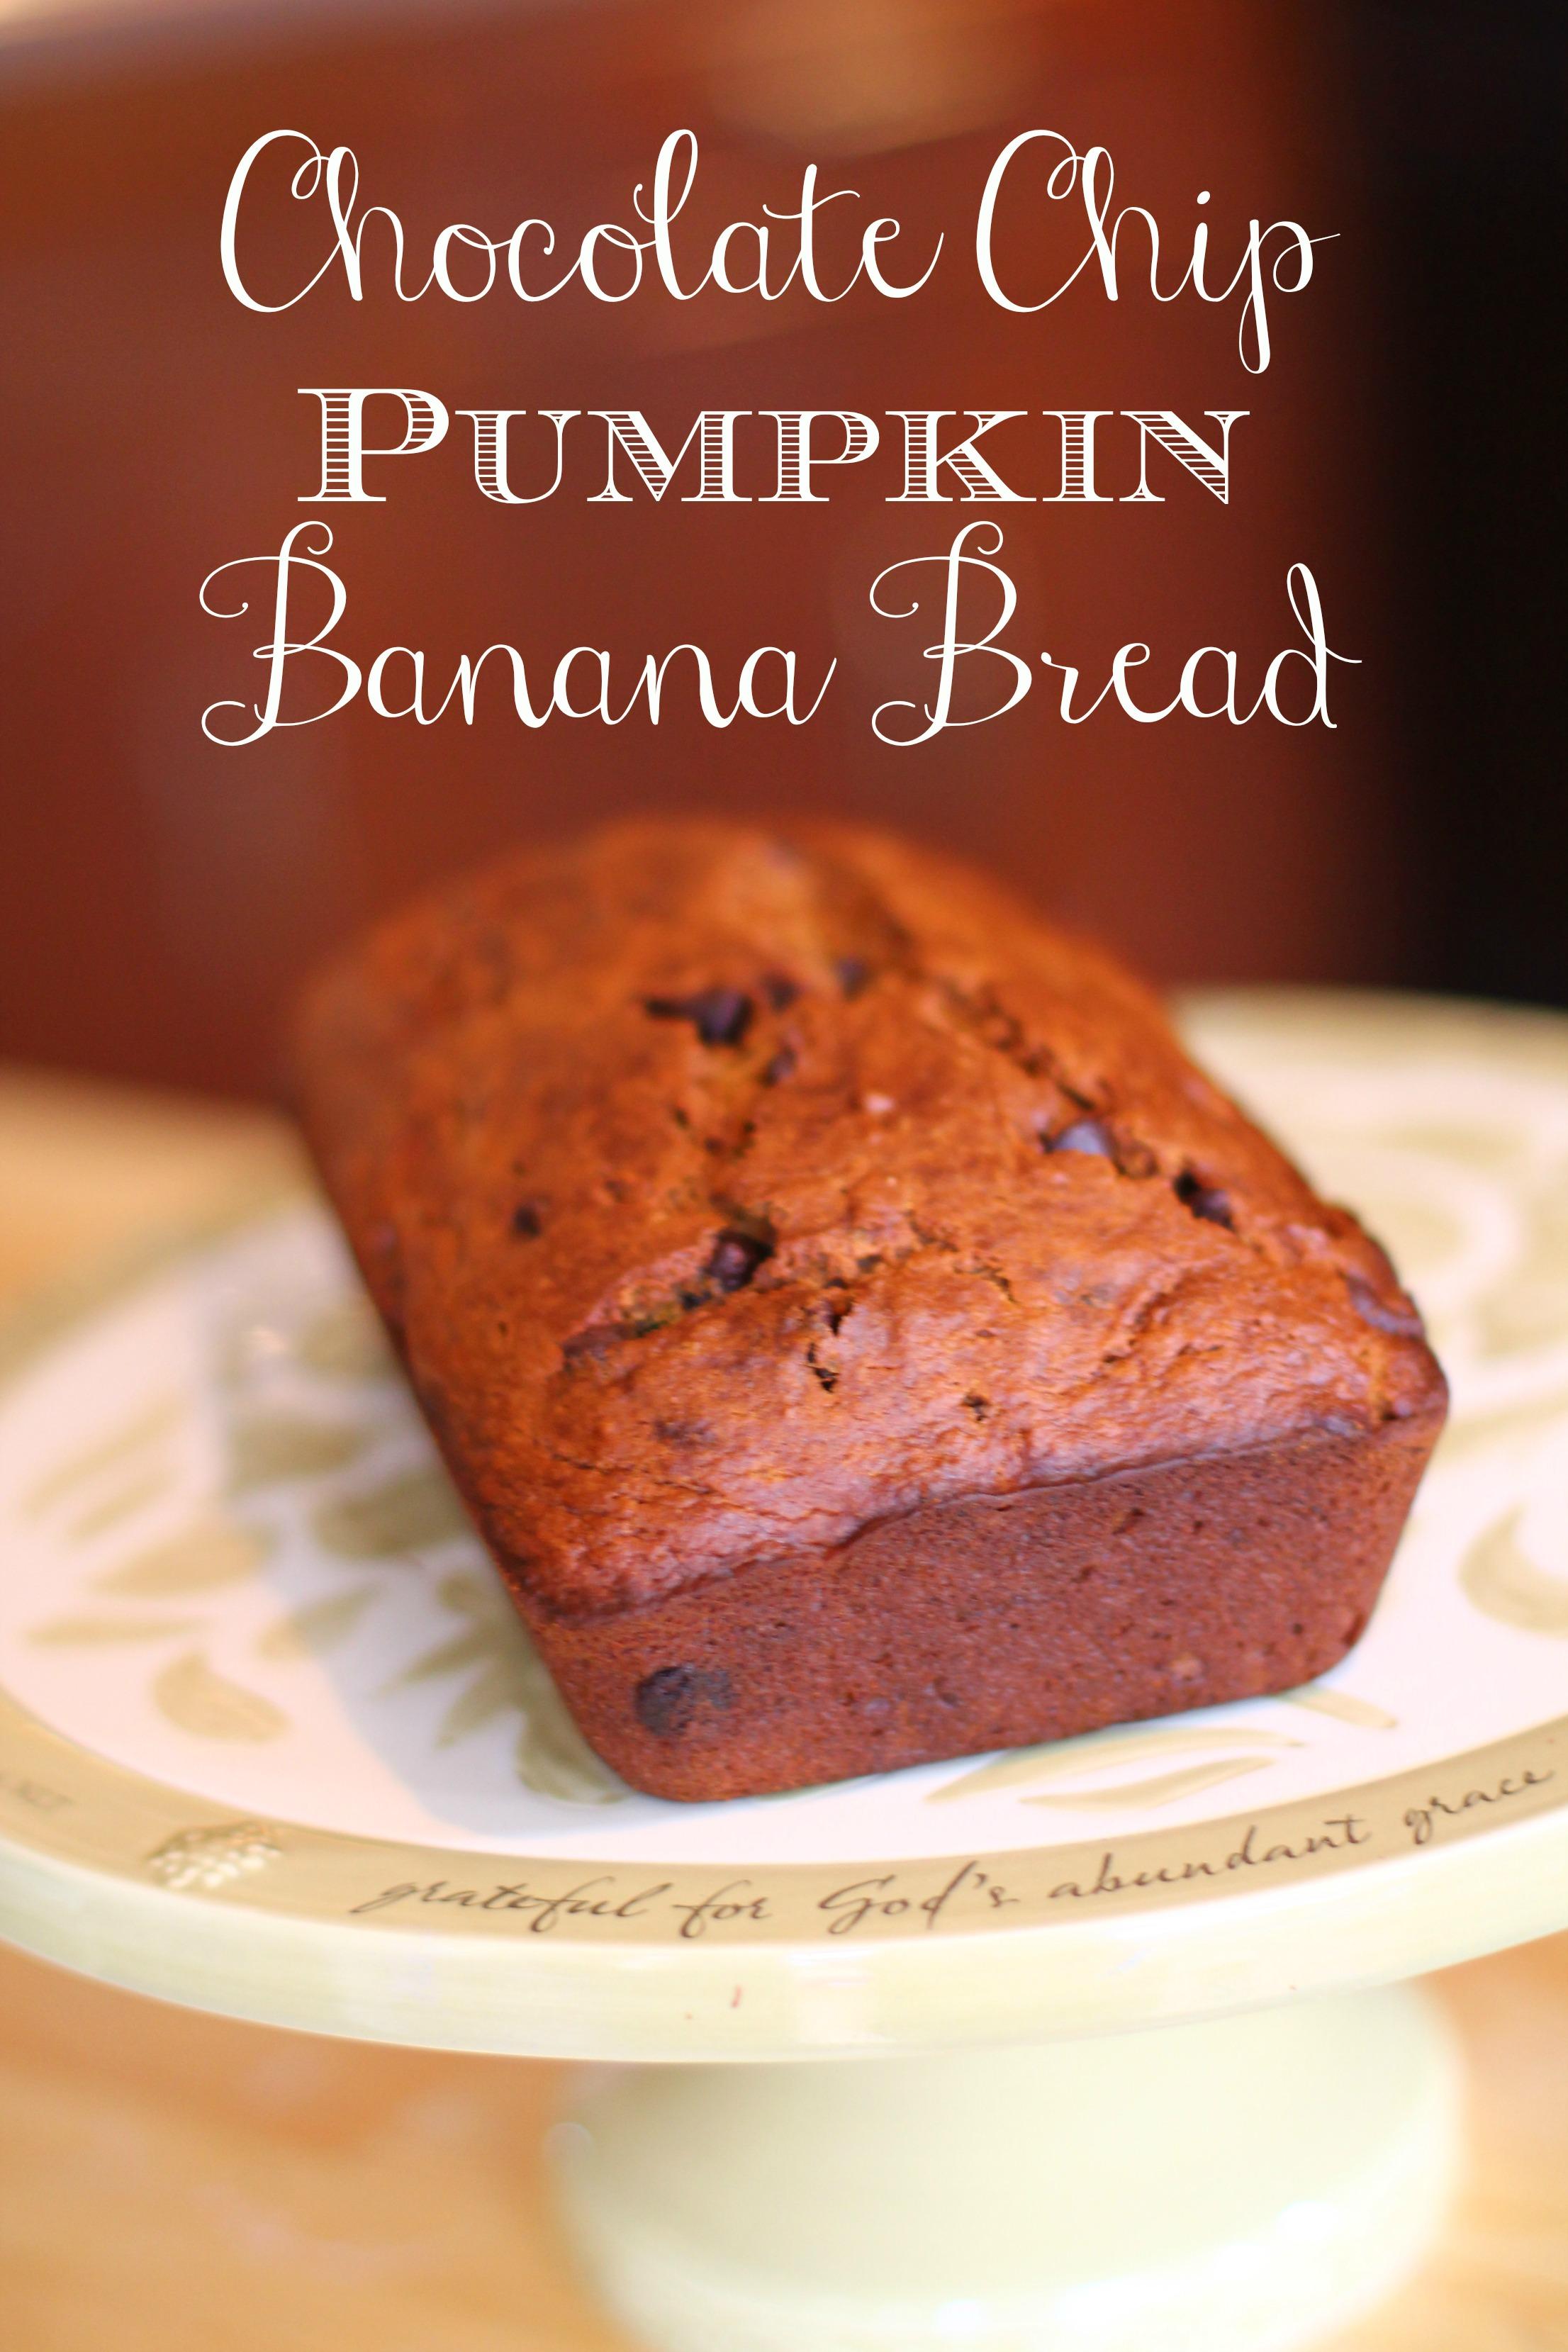 Easy Chocolate Chip Pumpkin Banana Bread - The Mom Creative